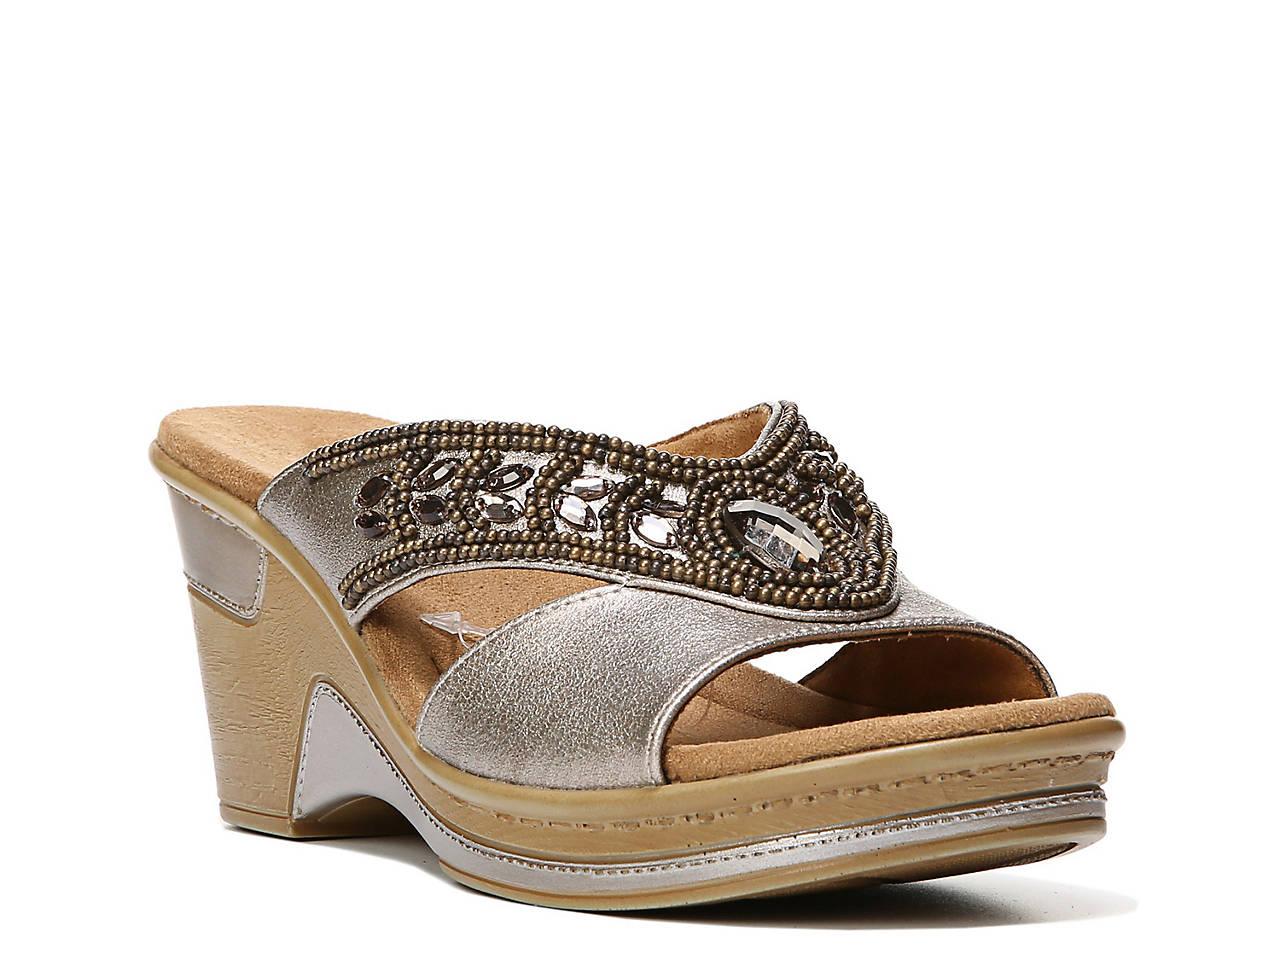 d4d58da7e44 Natural Soul Ragan Wedge Sandal Women s Shoes